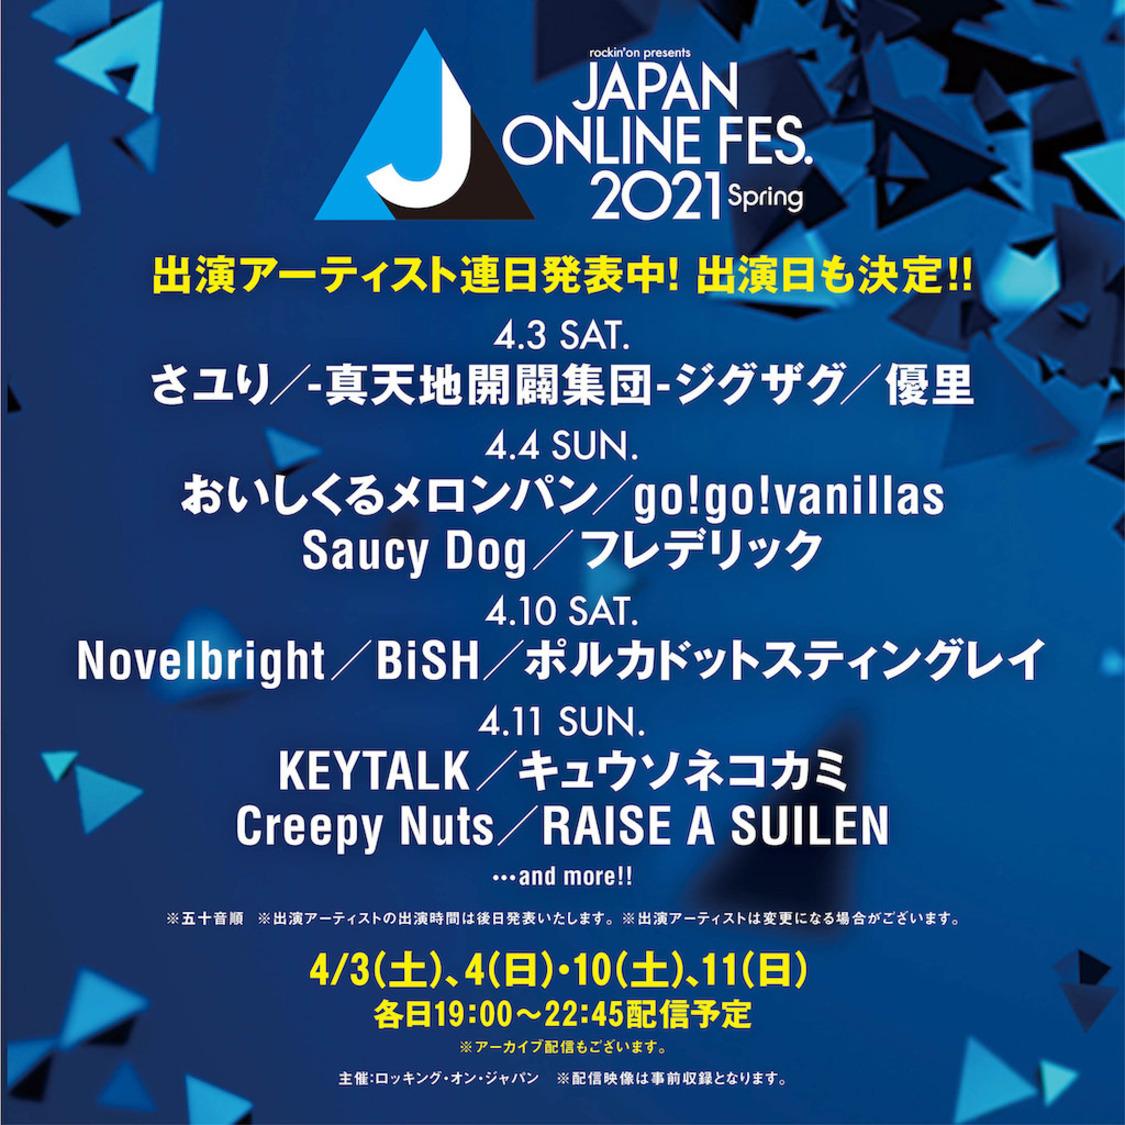 BiSH、4/10にオンラインフェス<JAPAN ONLINE FESTIVAL 2021 Spring>出演! ほか13組の出演日も解禁